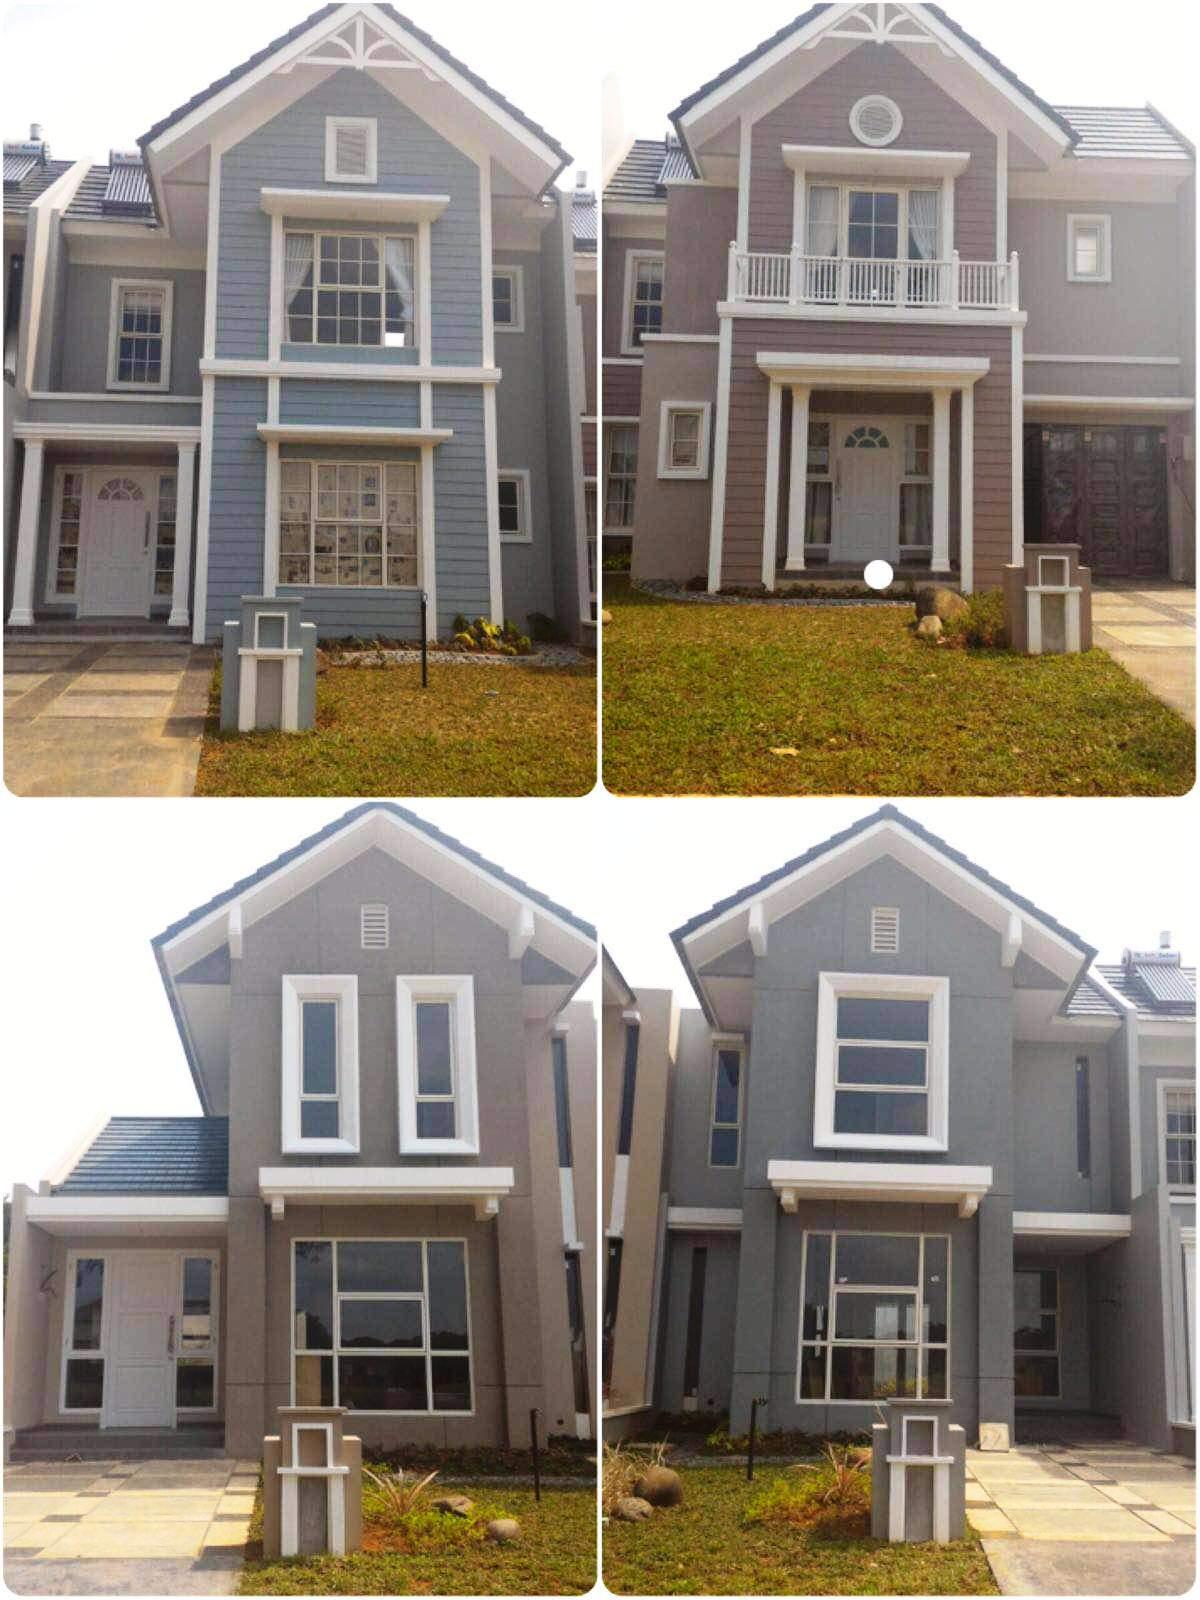 Lifestyle property open house suvarna sutera for Terrace 9 suvarna sutera